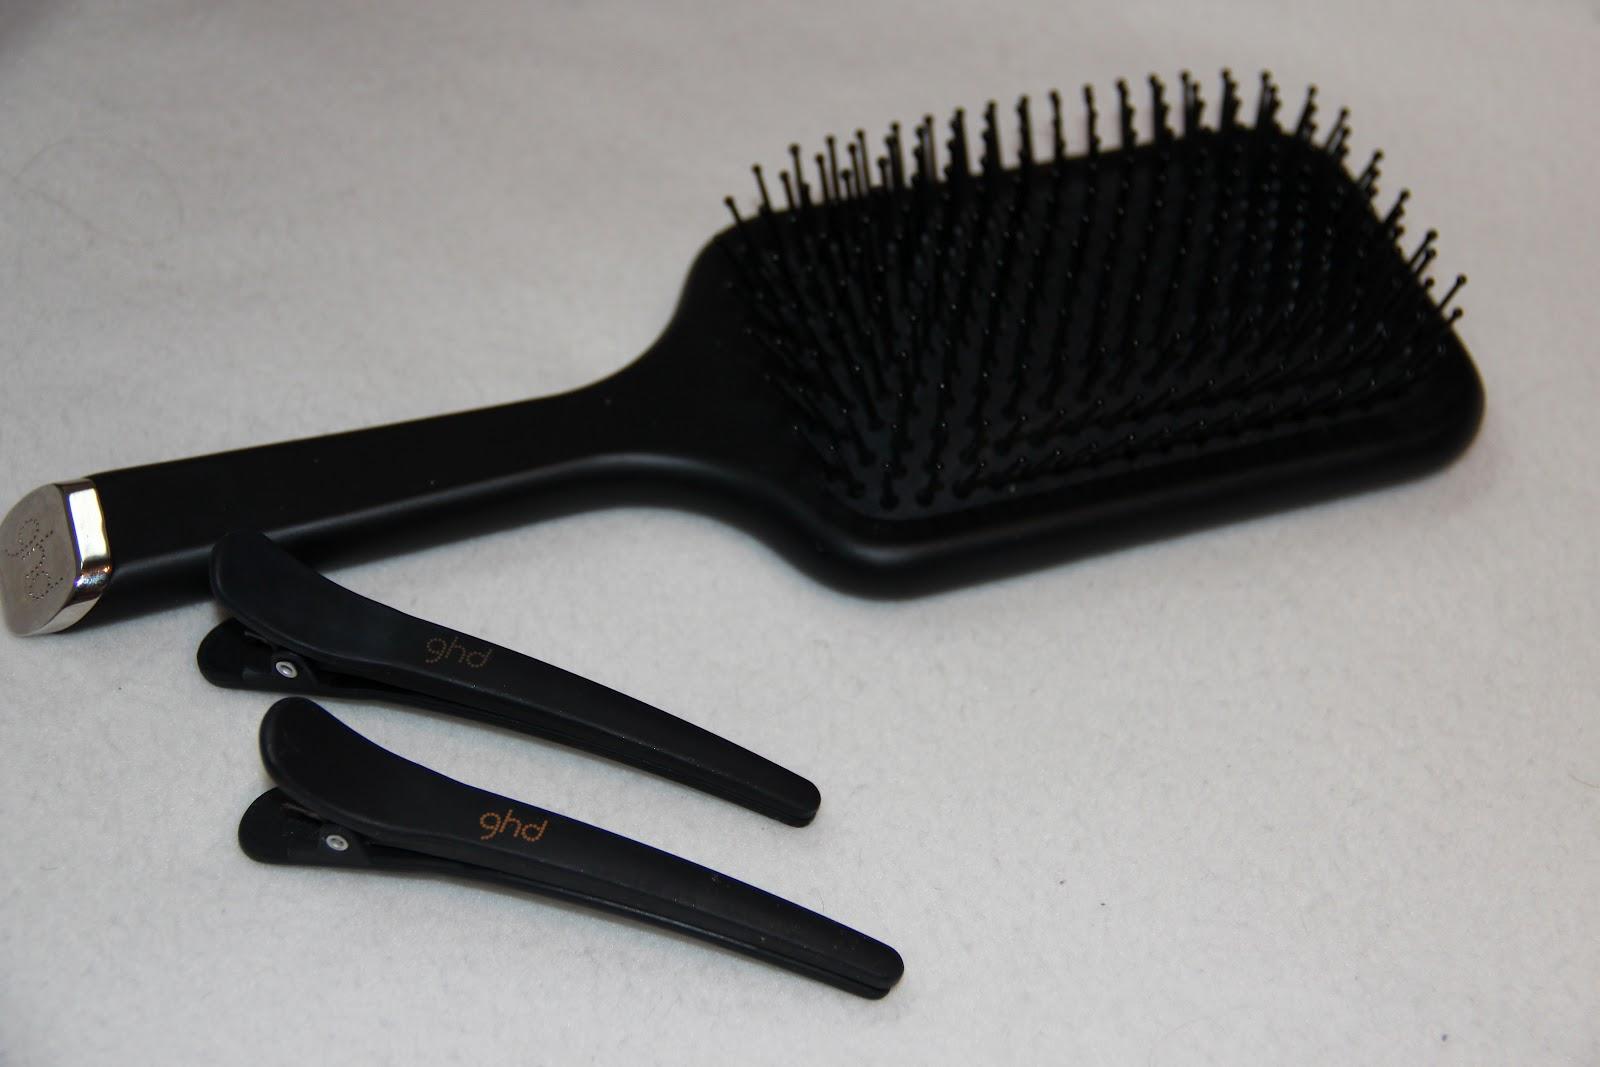 ghd hair straighteners newhairstylesformen2014com